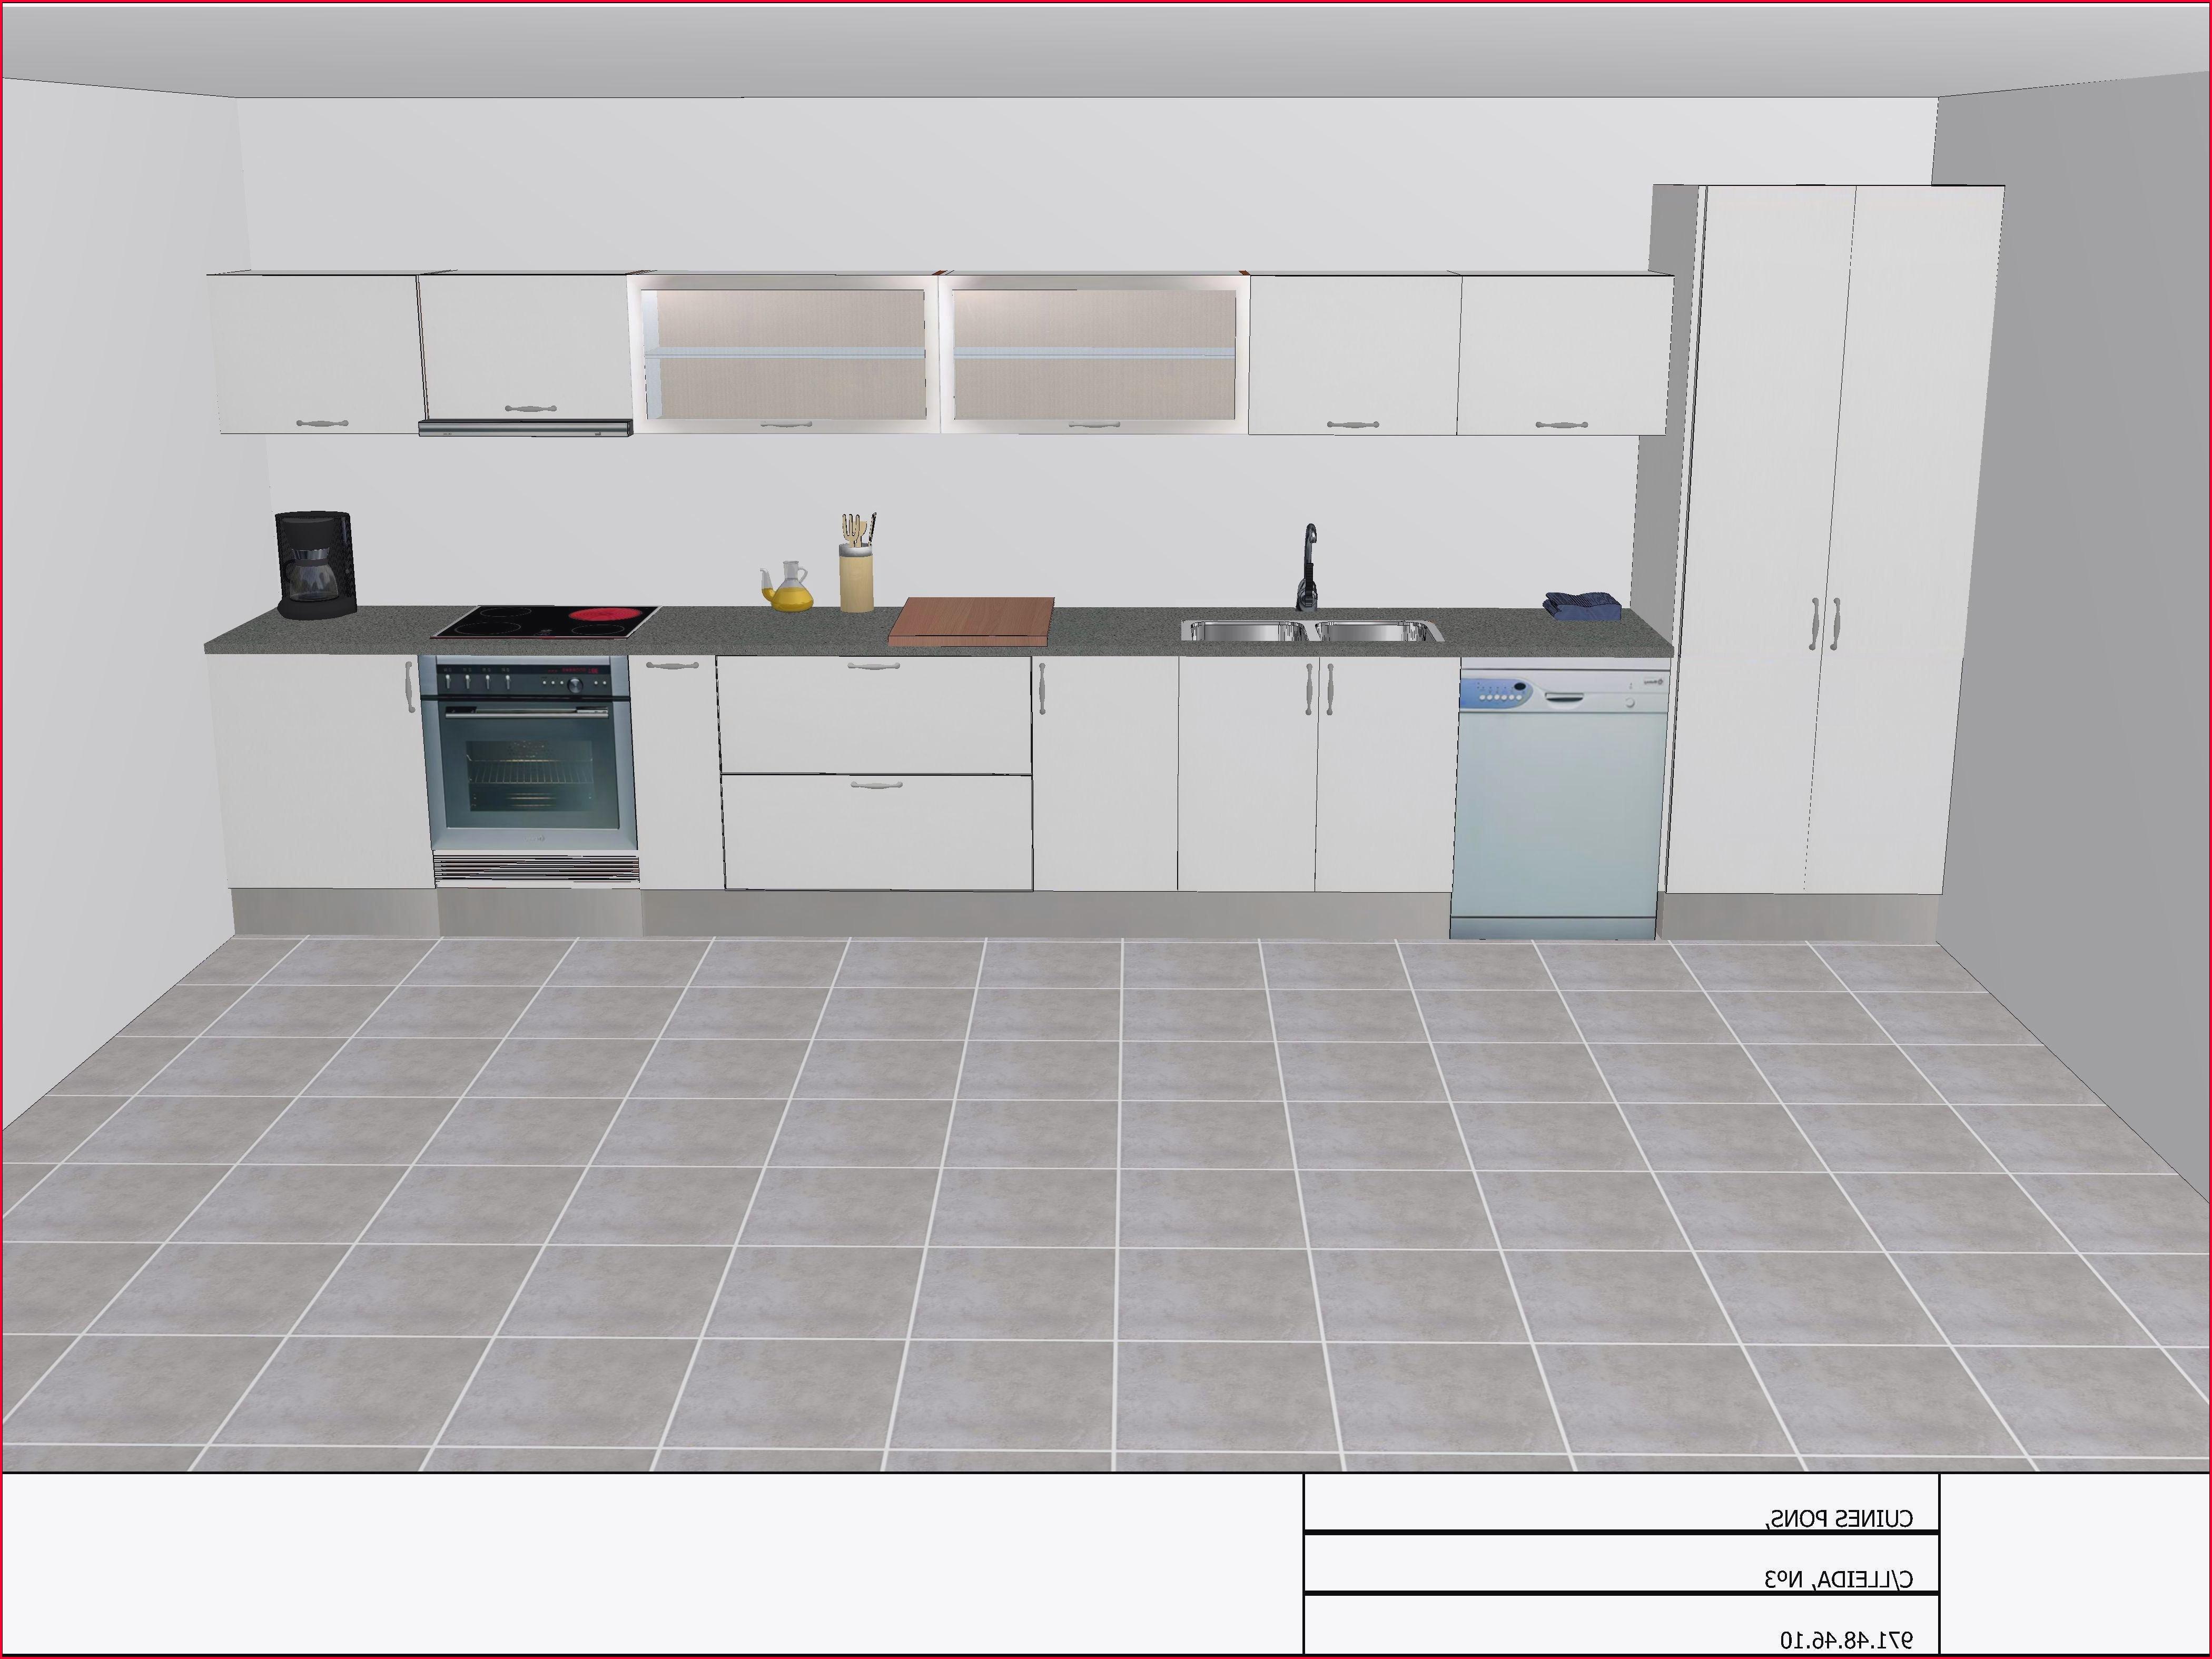 Programa Diseño Muebles 3d Gratis Zwdg Diseà O Cocina 3d Disenar Cocinas Line Gratis Decoracià N